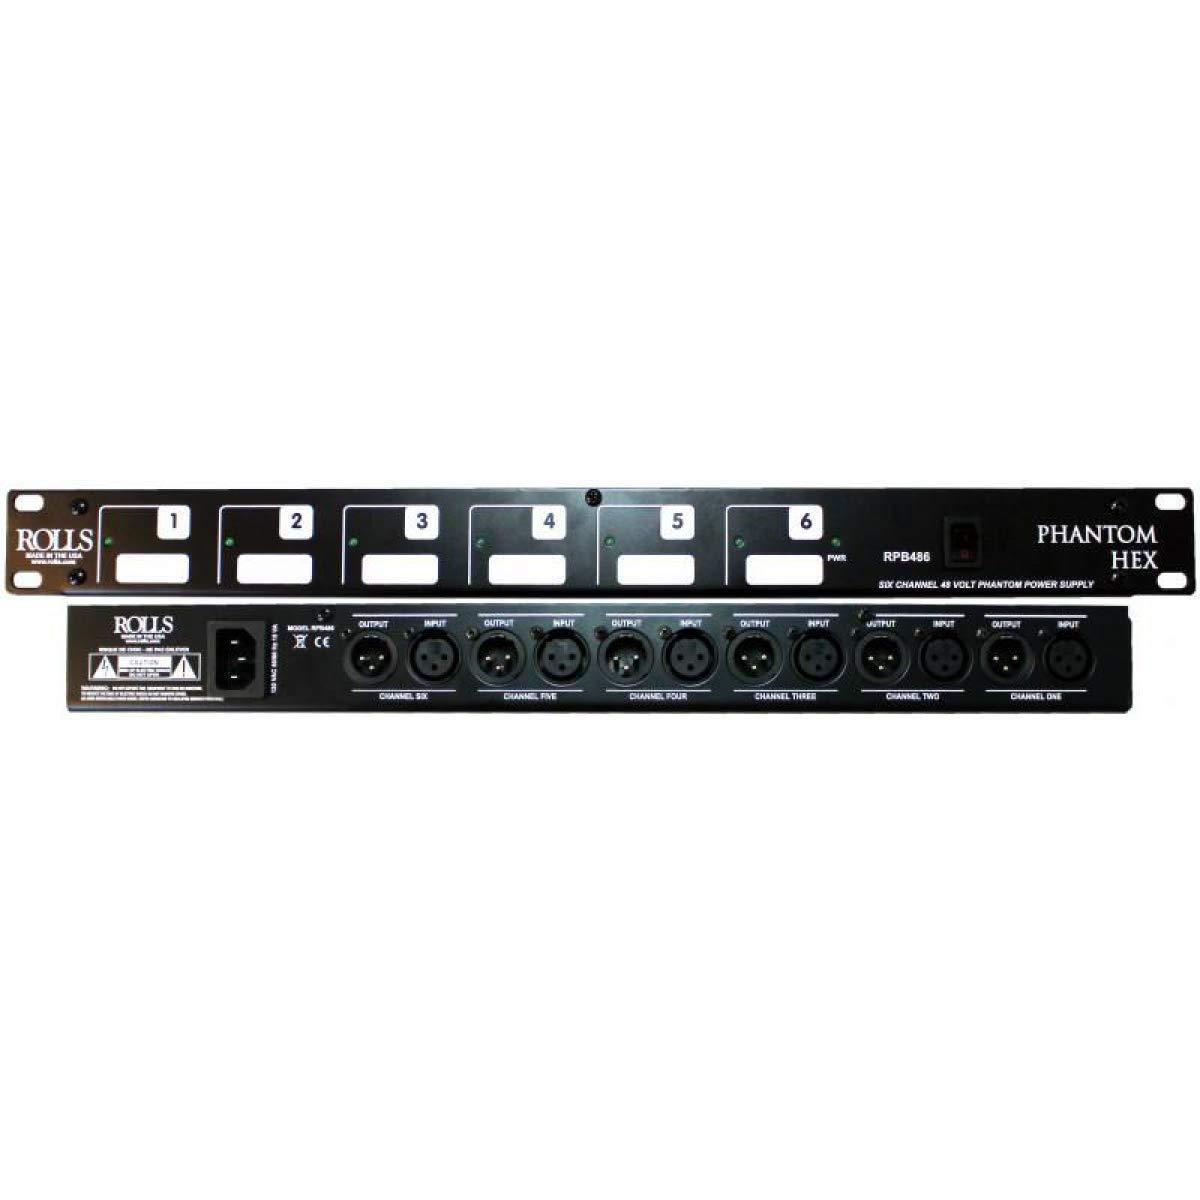 B001032III rolls Hex 6-CH Phantom Power (RPB486) 61uBqrPGUjL._SL1200_